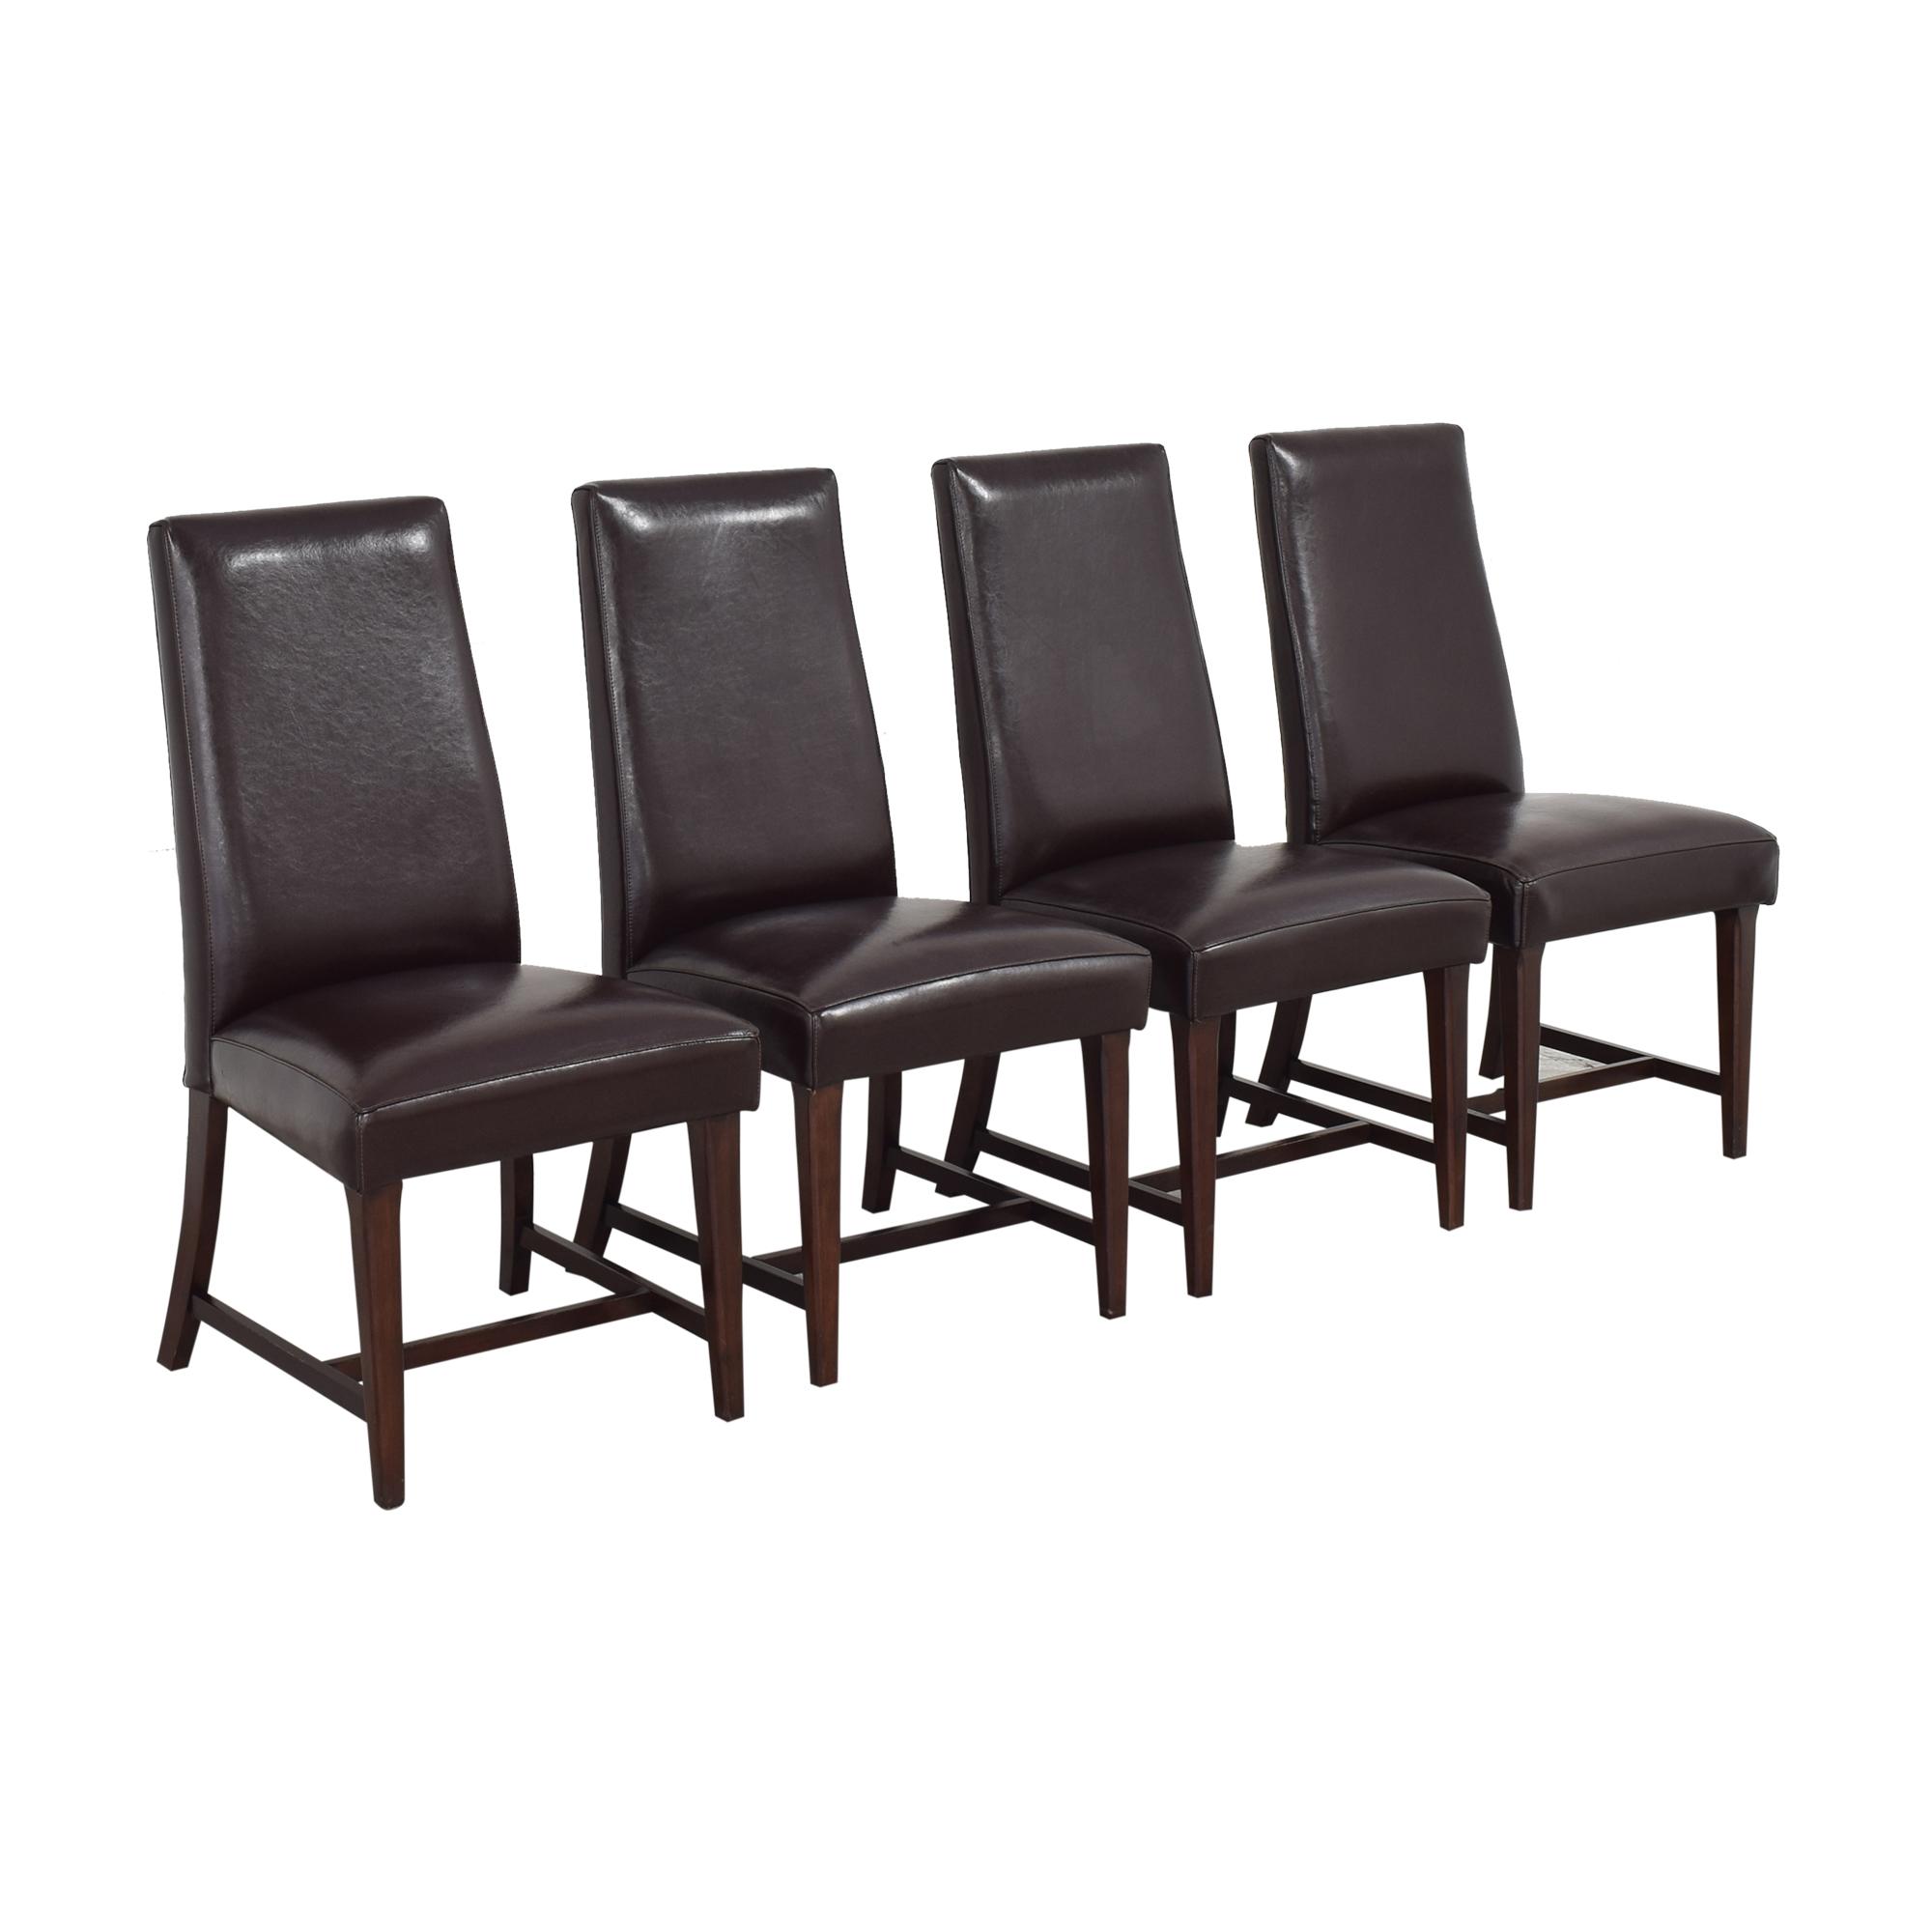 Shermag Shermag High Back Dining Chairs coupon